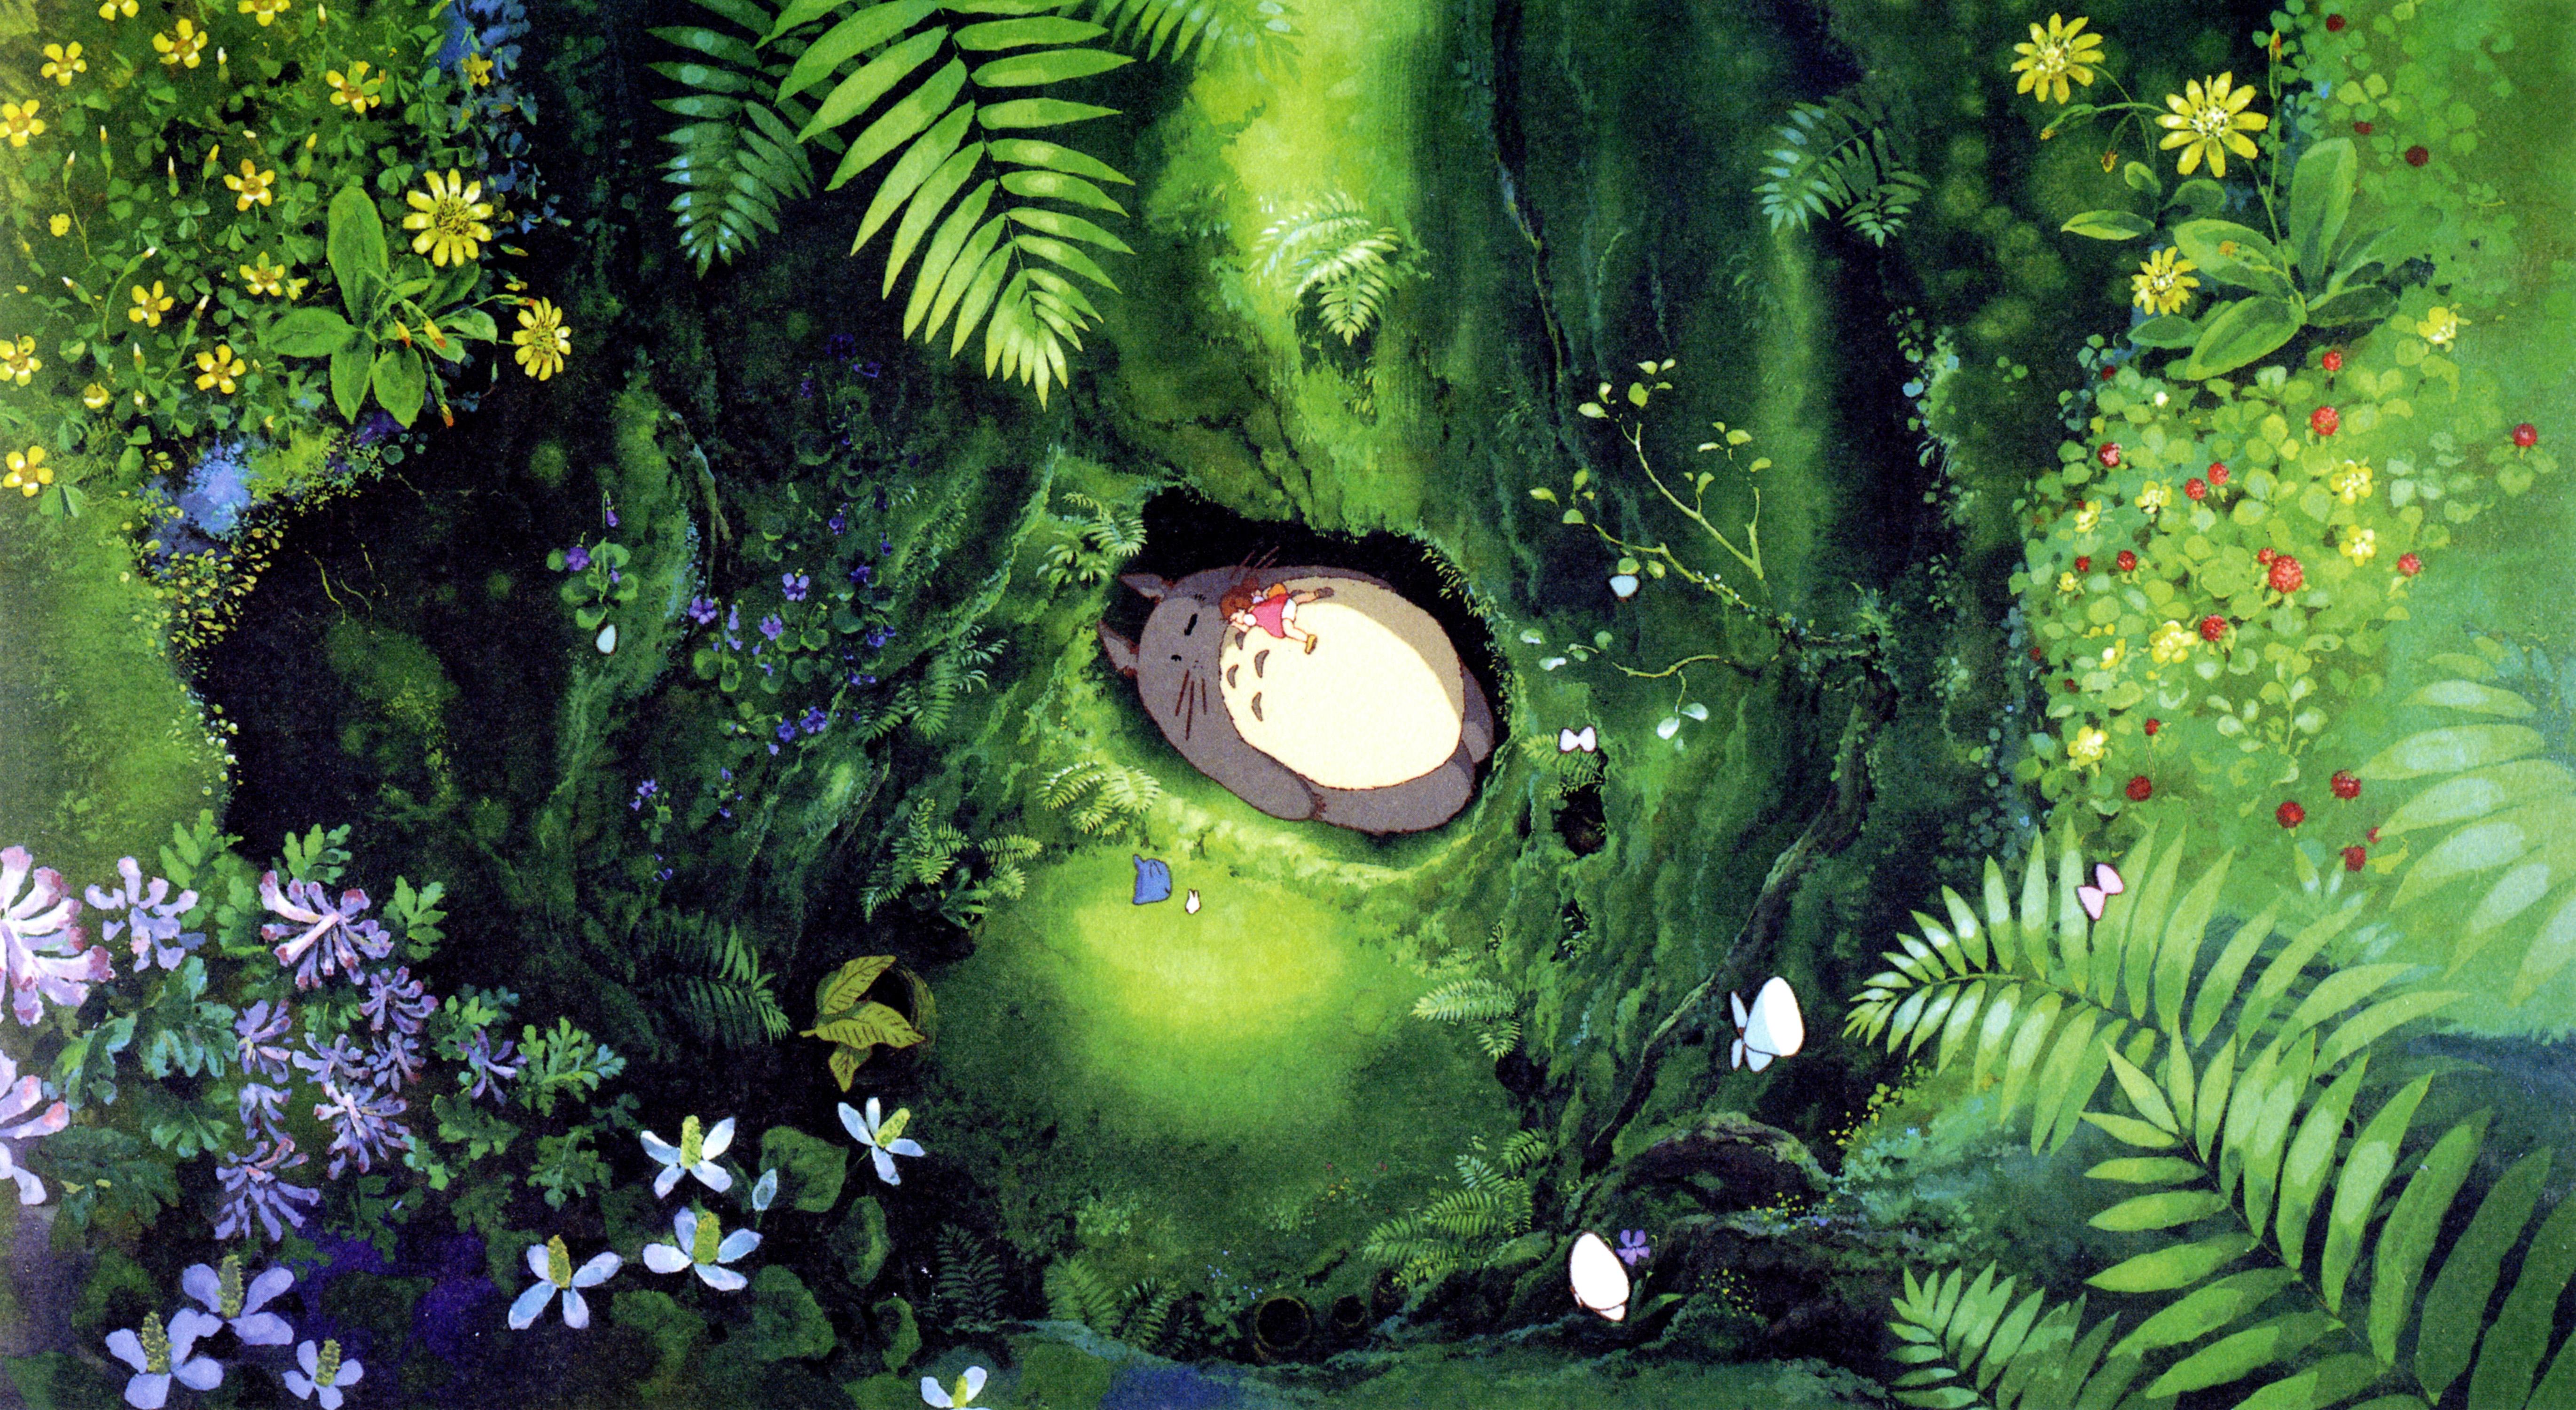 Hayao Miyazaki Wallpaper And Scan Gallery Minitokyo